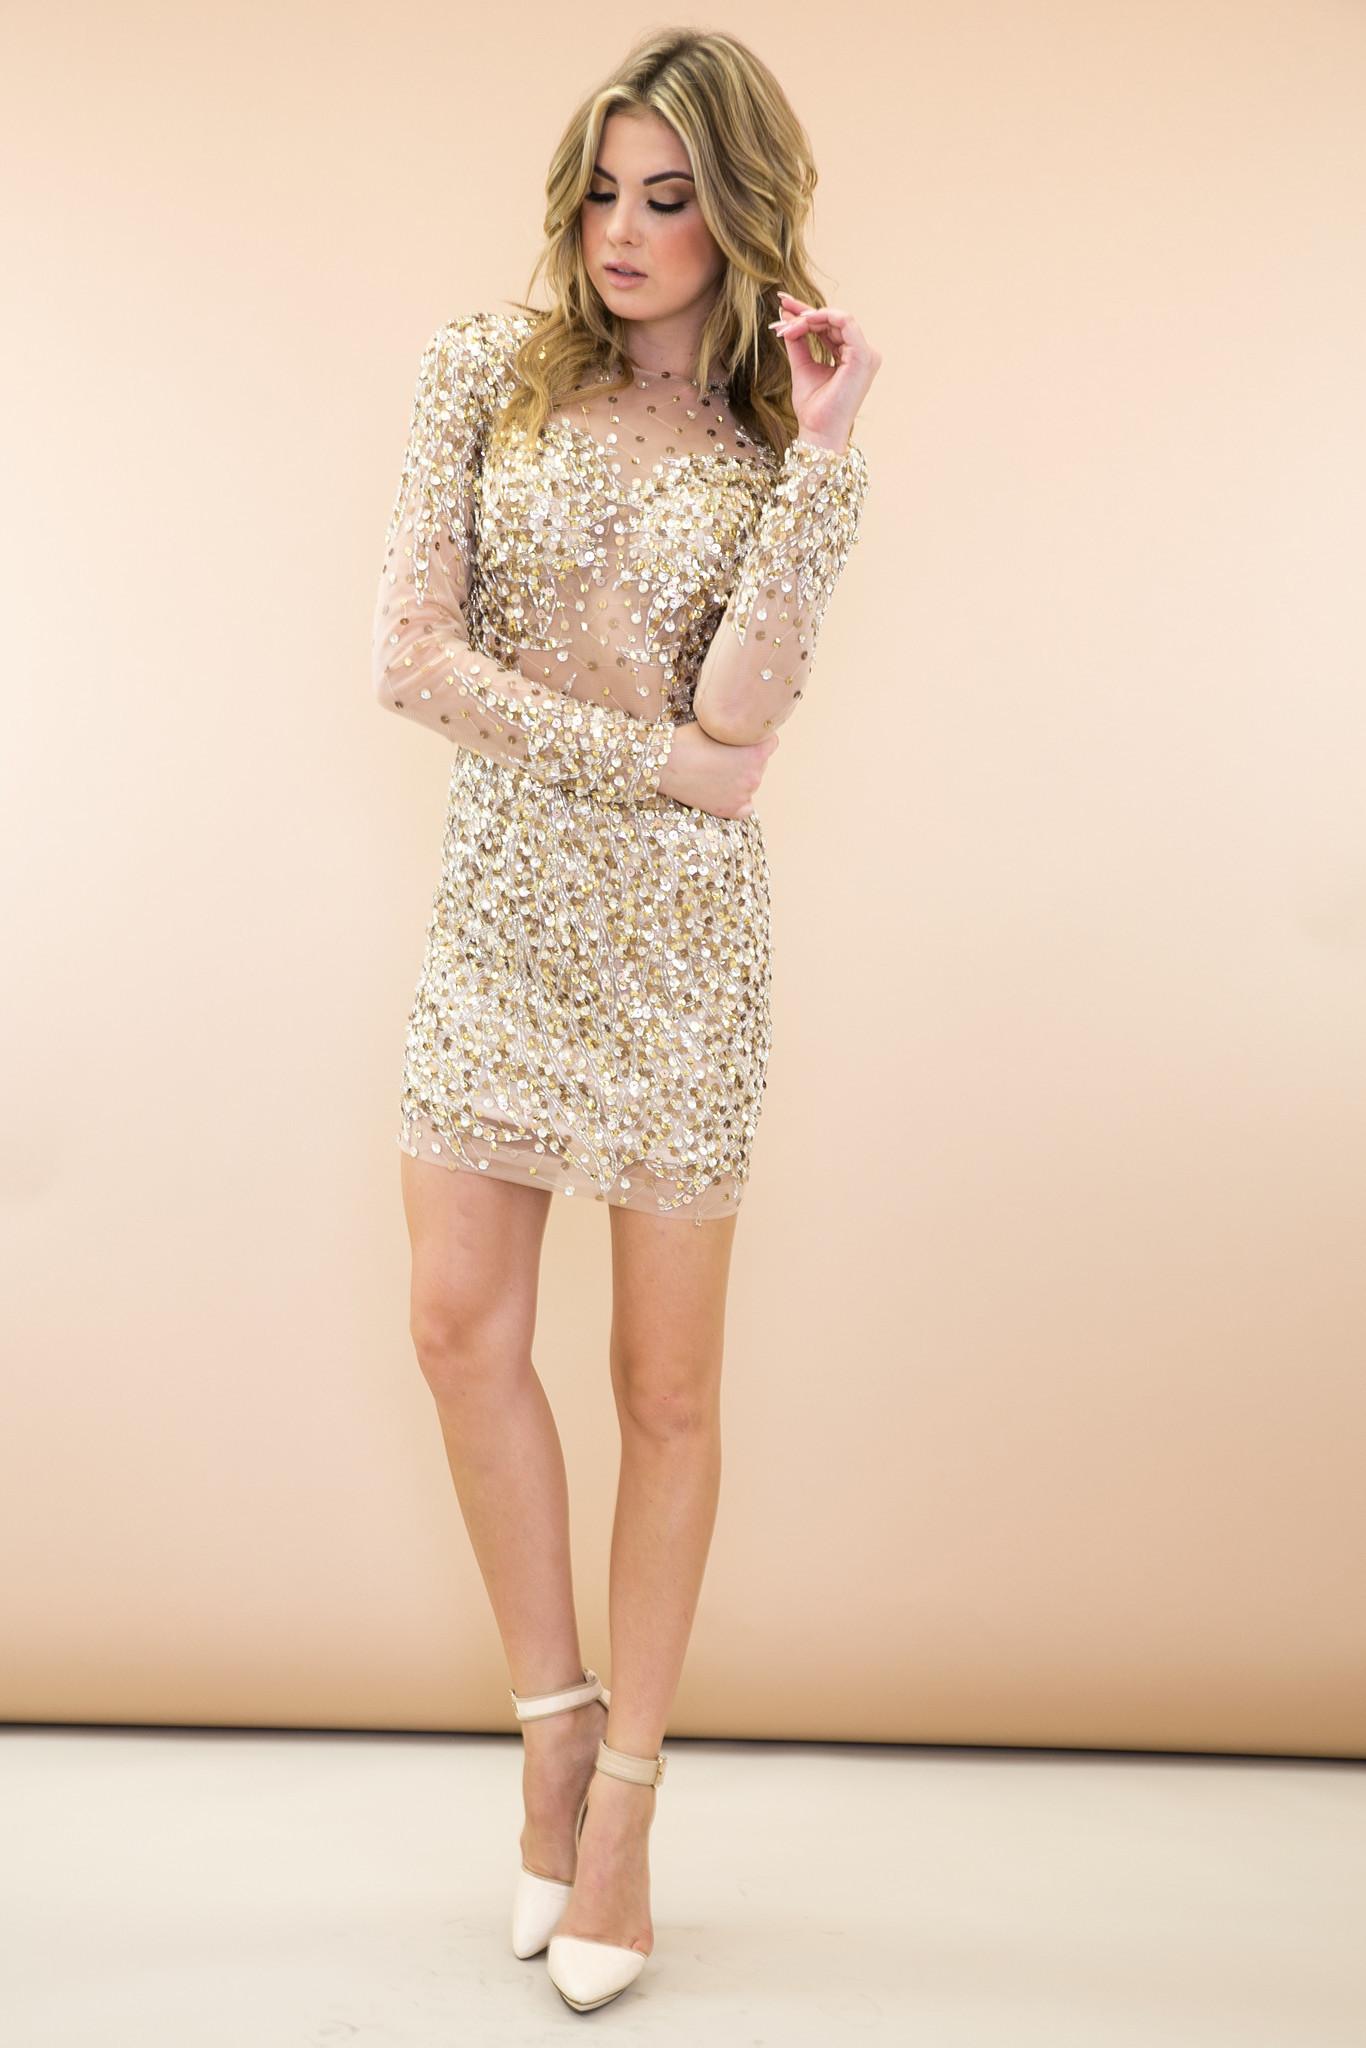 & Sequin Evening Body-con Dress - Gold   Haute & Rebellious